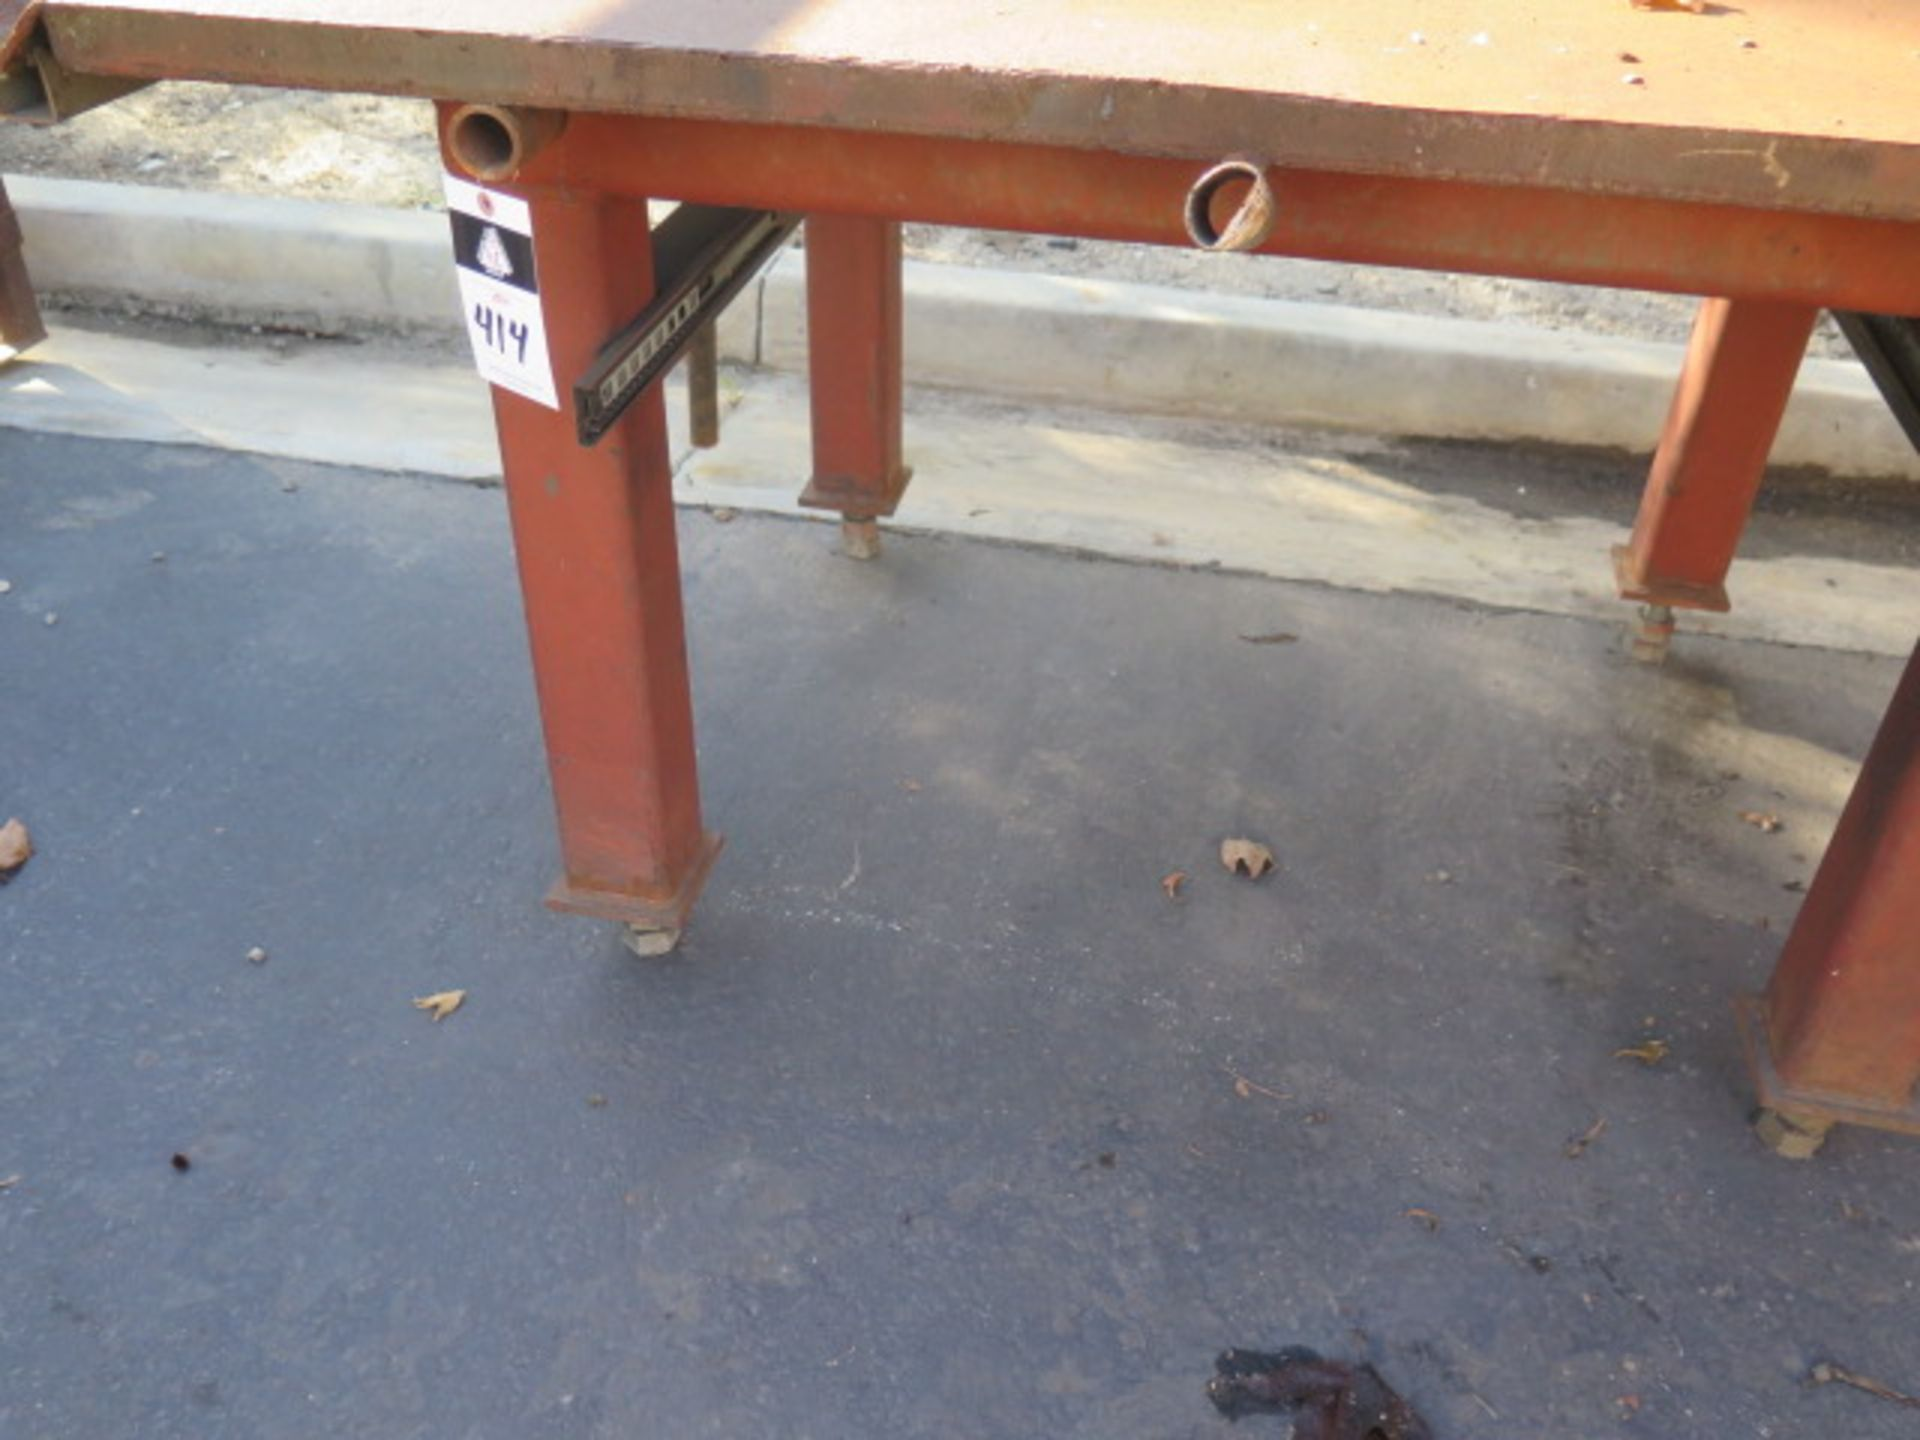 "4' x 8' x 1 1/2"" Steel Welding Table (SOLD AS-IS - NO WARRANTY) - Image 4 of 5"